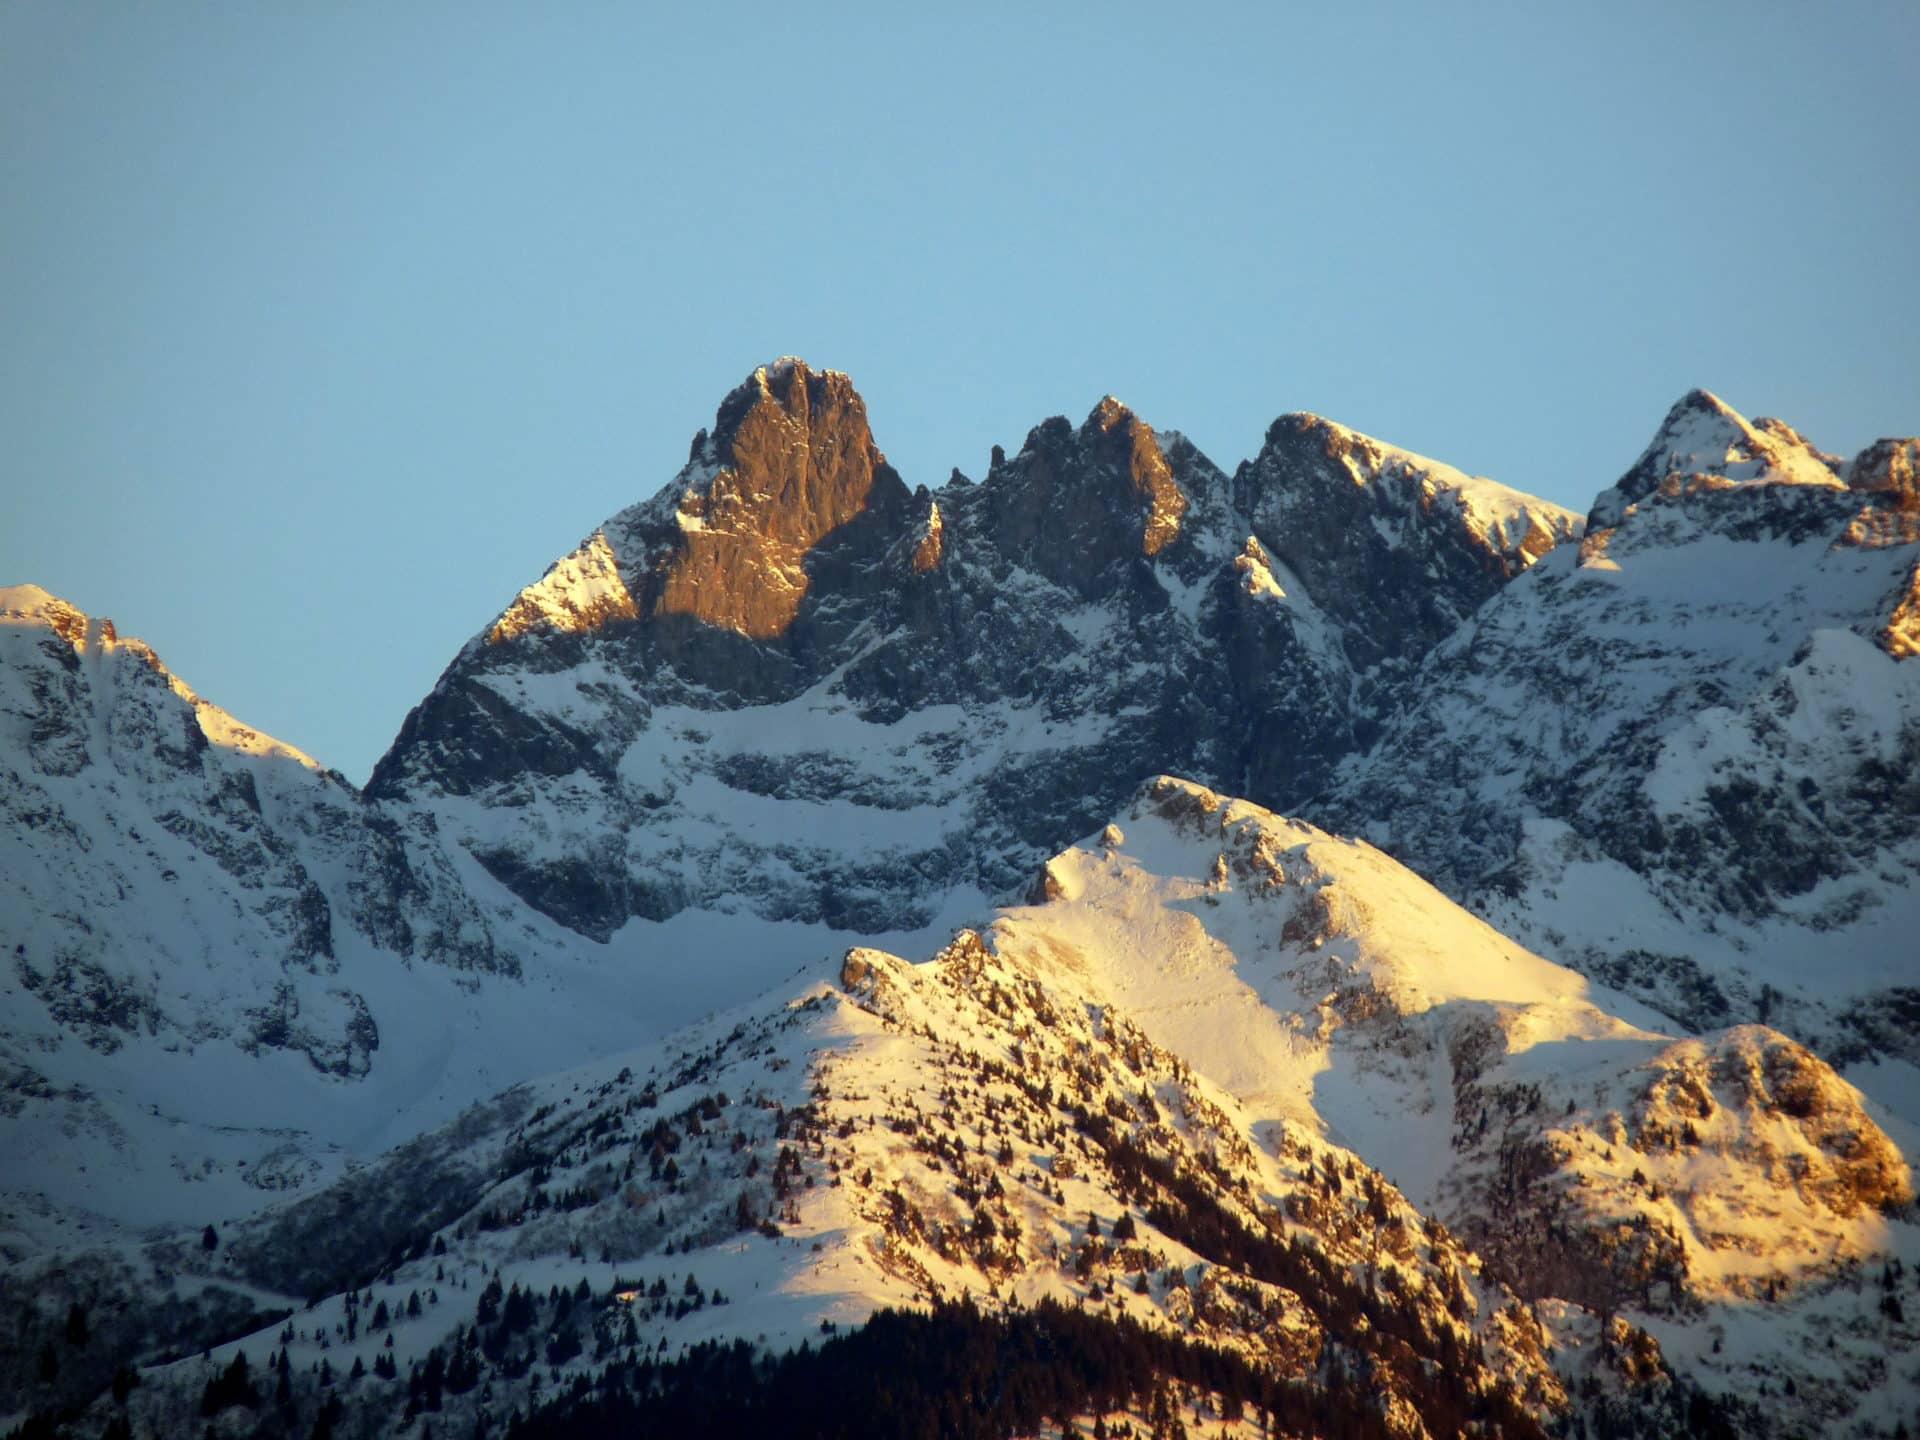 Half-day ski touring trip in Belledonne, France